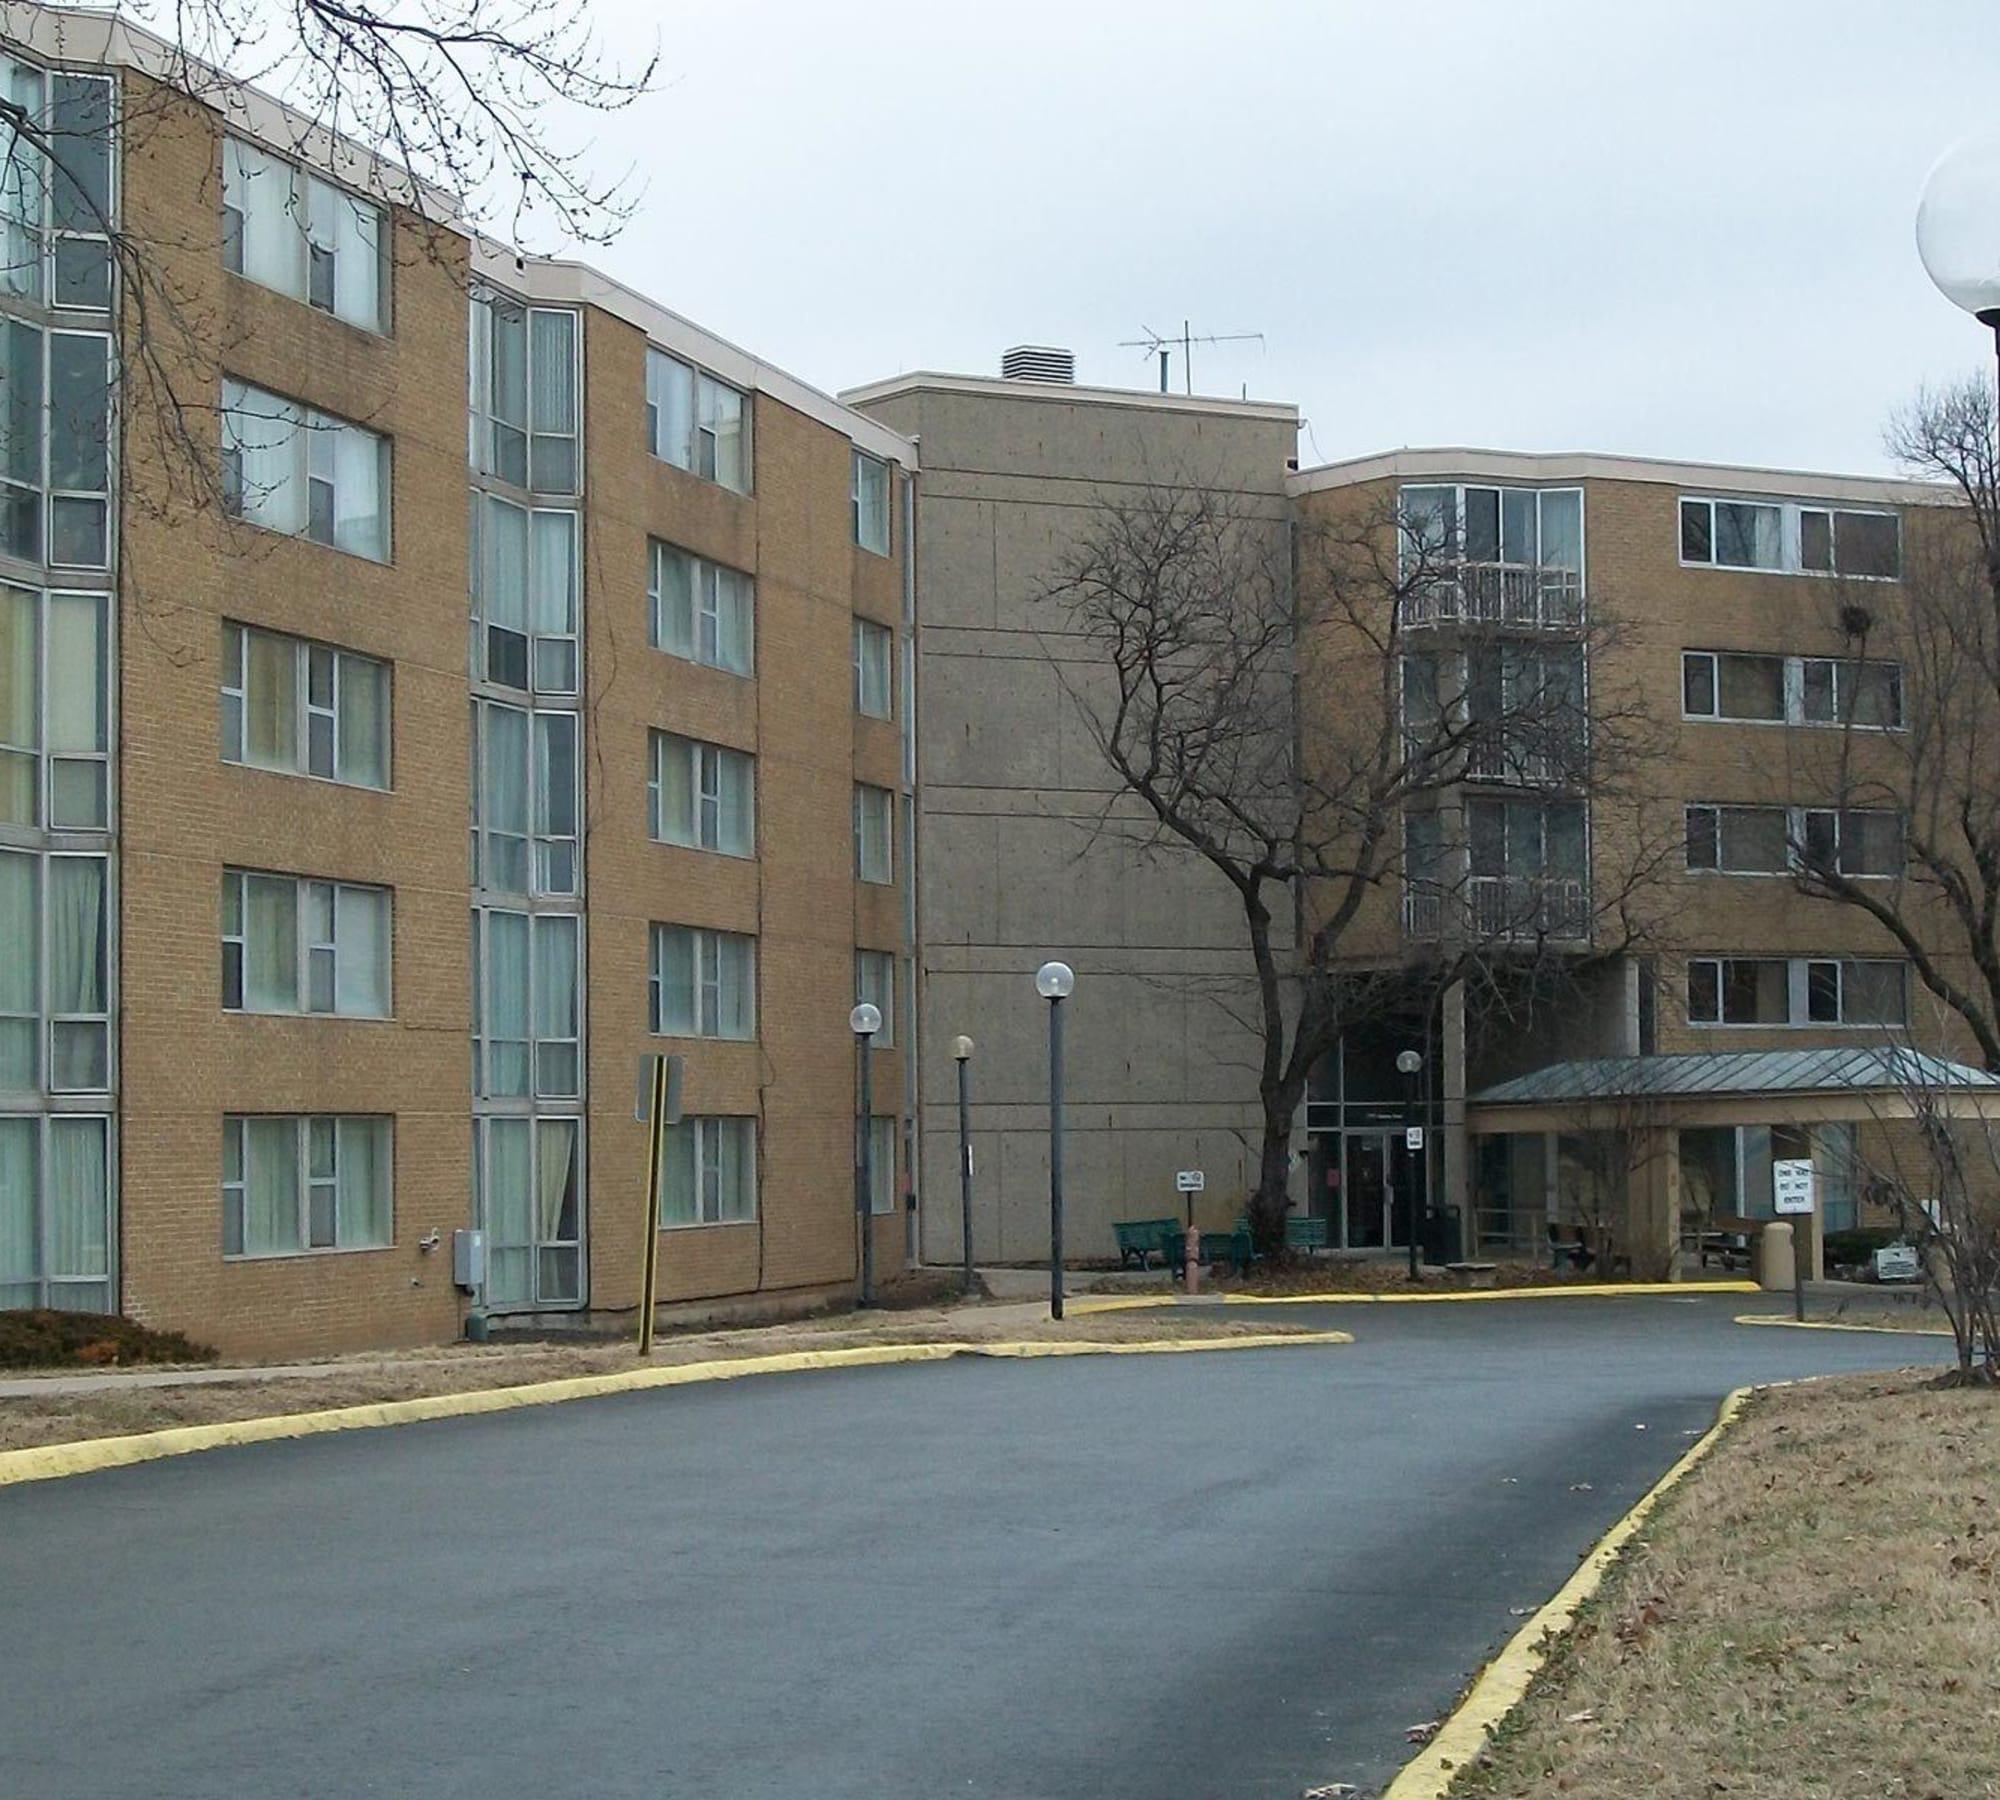 Local Cheap Apartments: South Kansas City, MO Senior Apartments For Rent